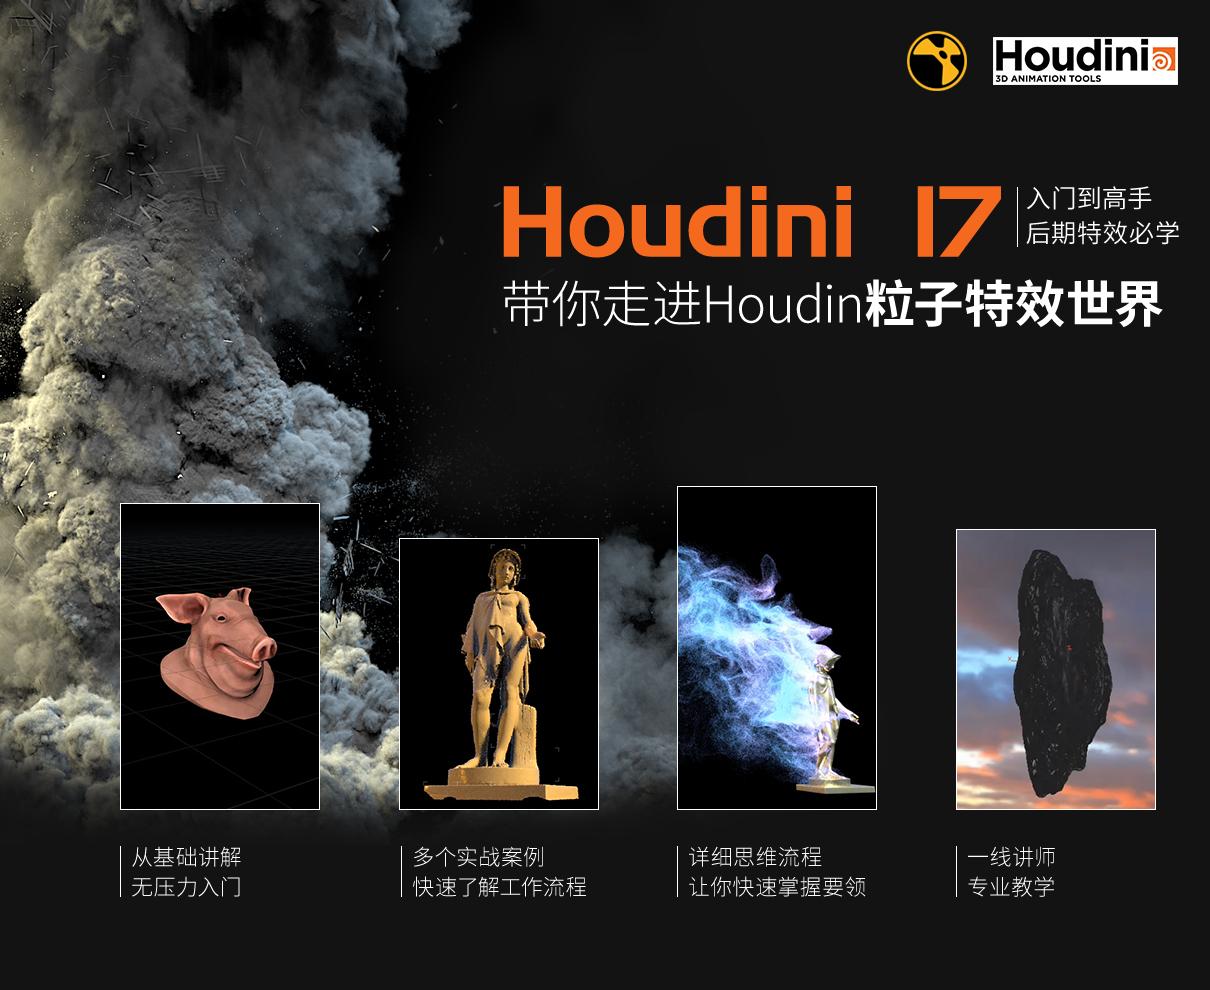 Houdini海报.jpg